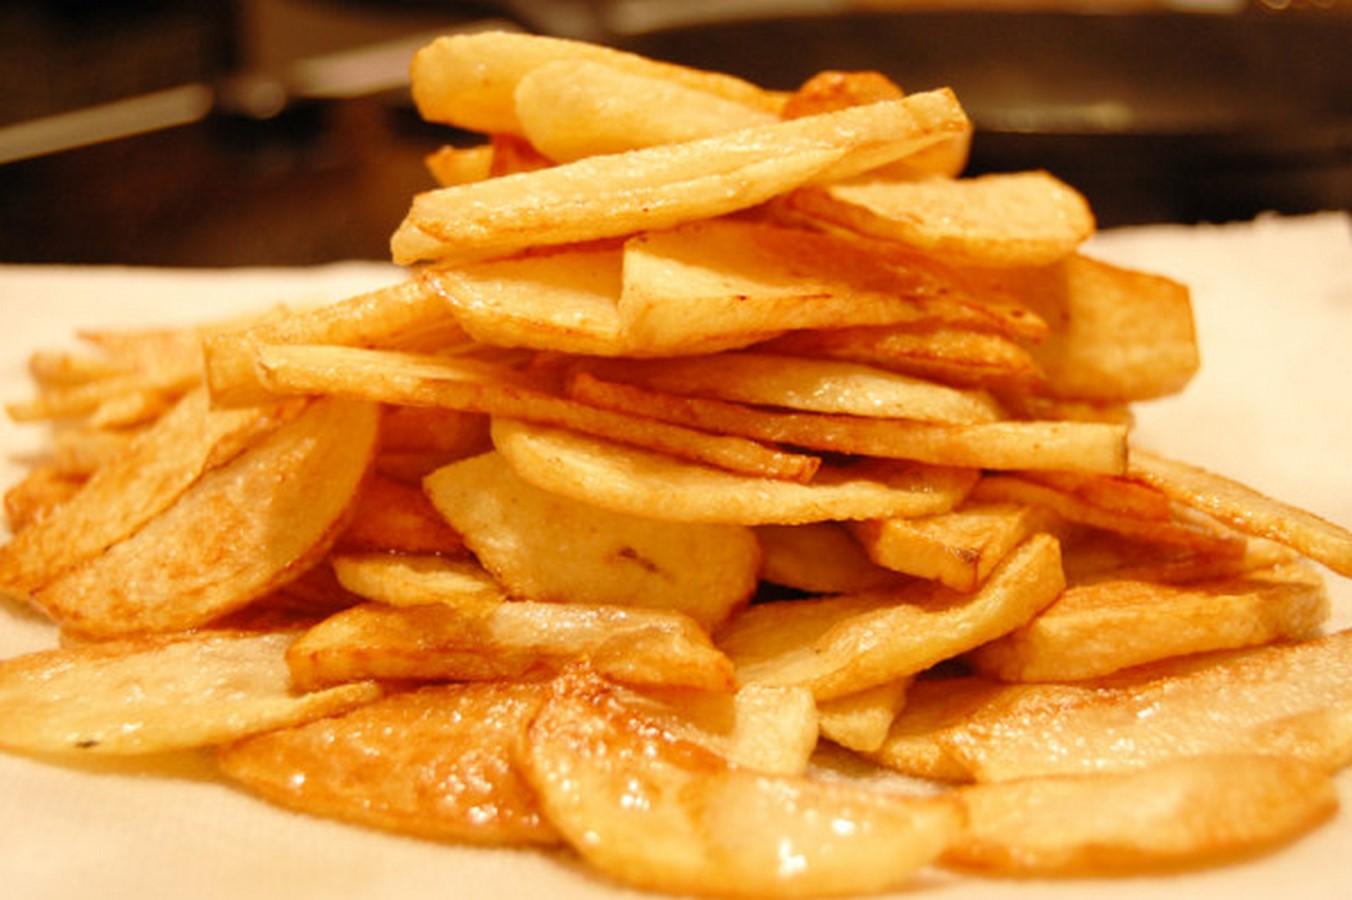 Pan-Fried-Potatoes-17